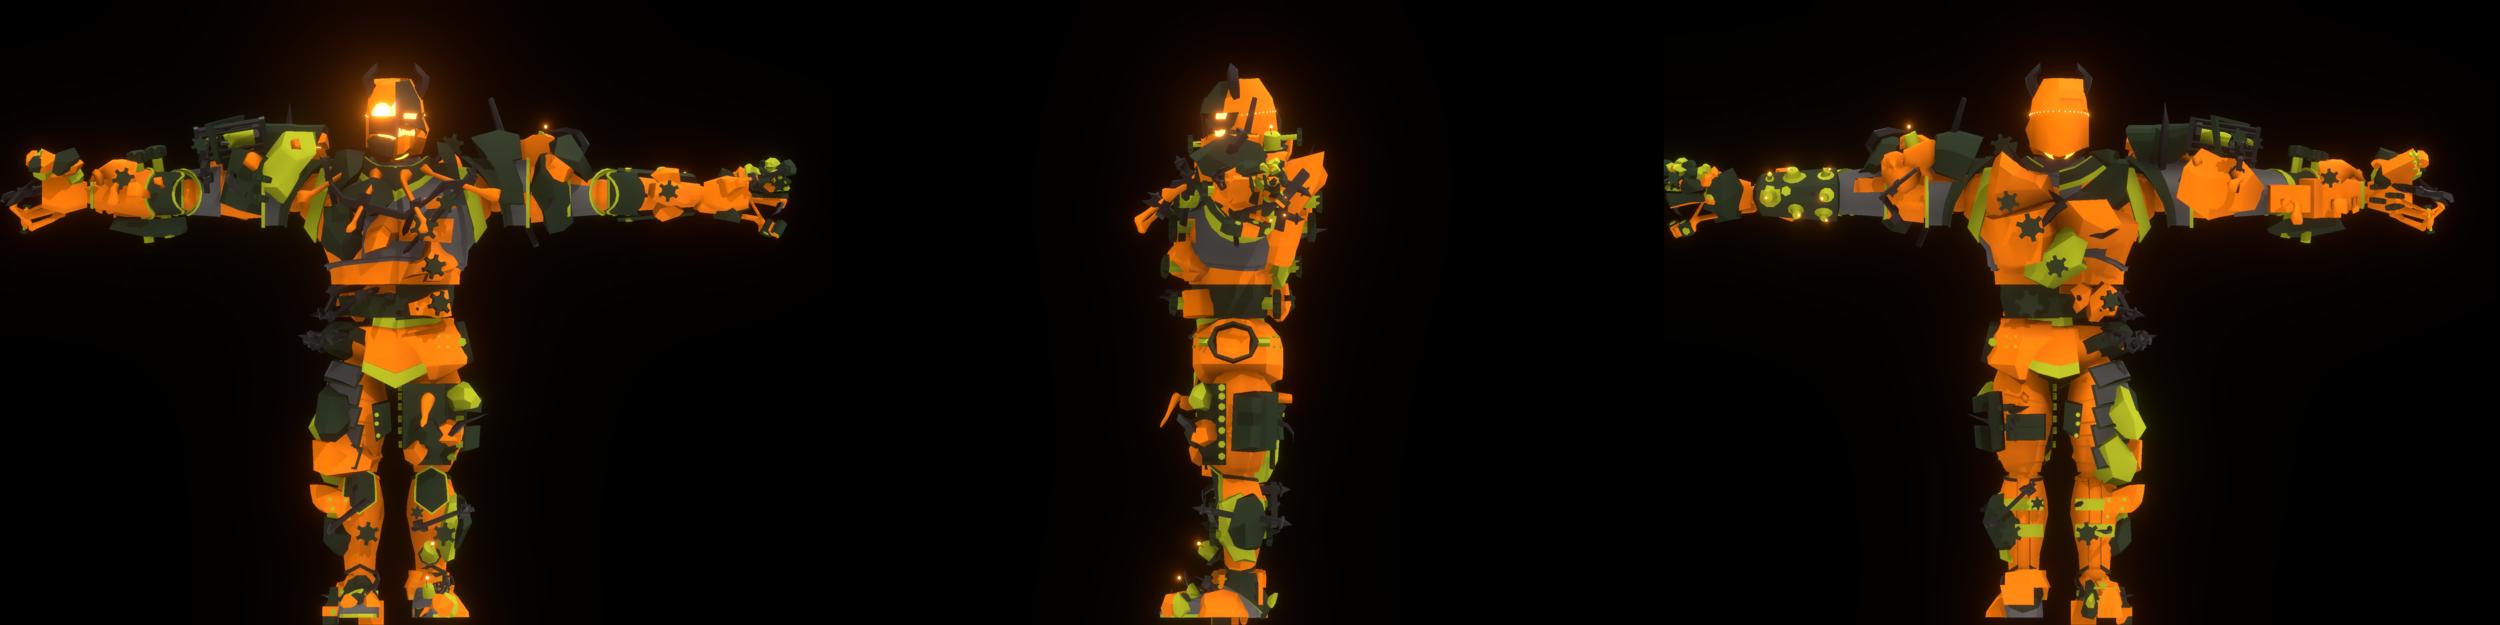 Dismantle: Construct Carnage, Character Design Retrospective, Great Helm - 18